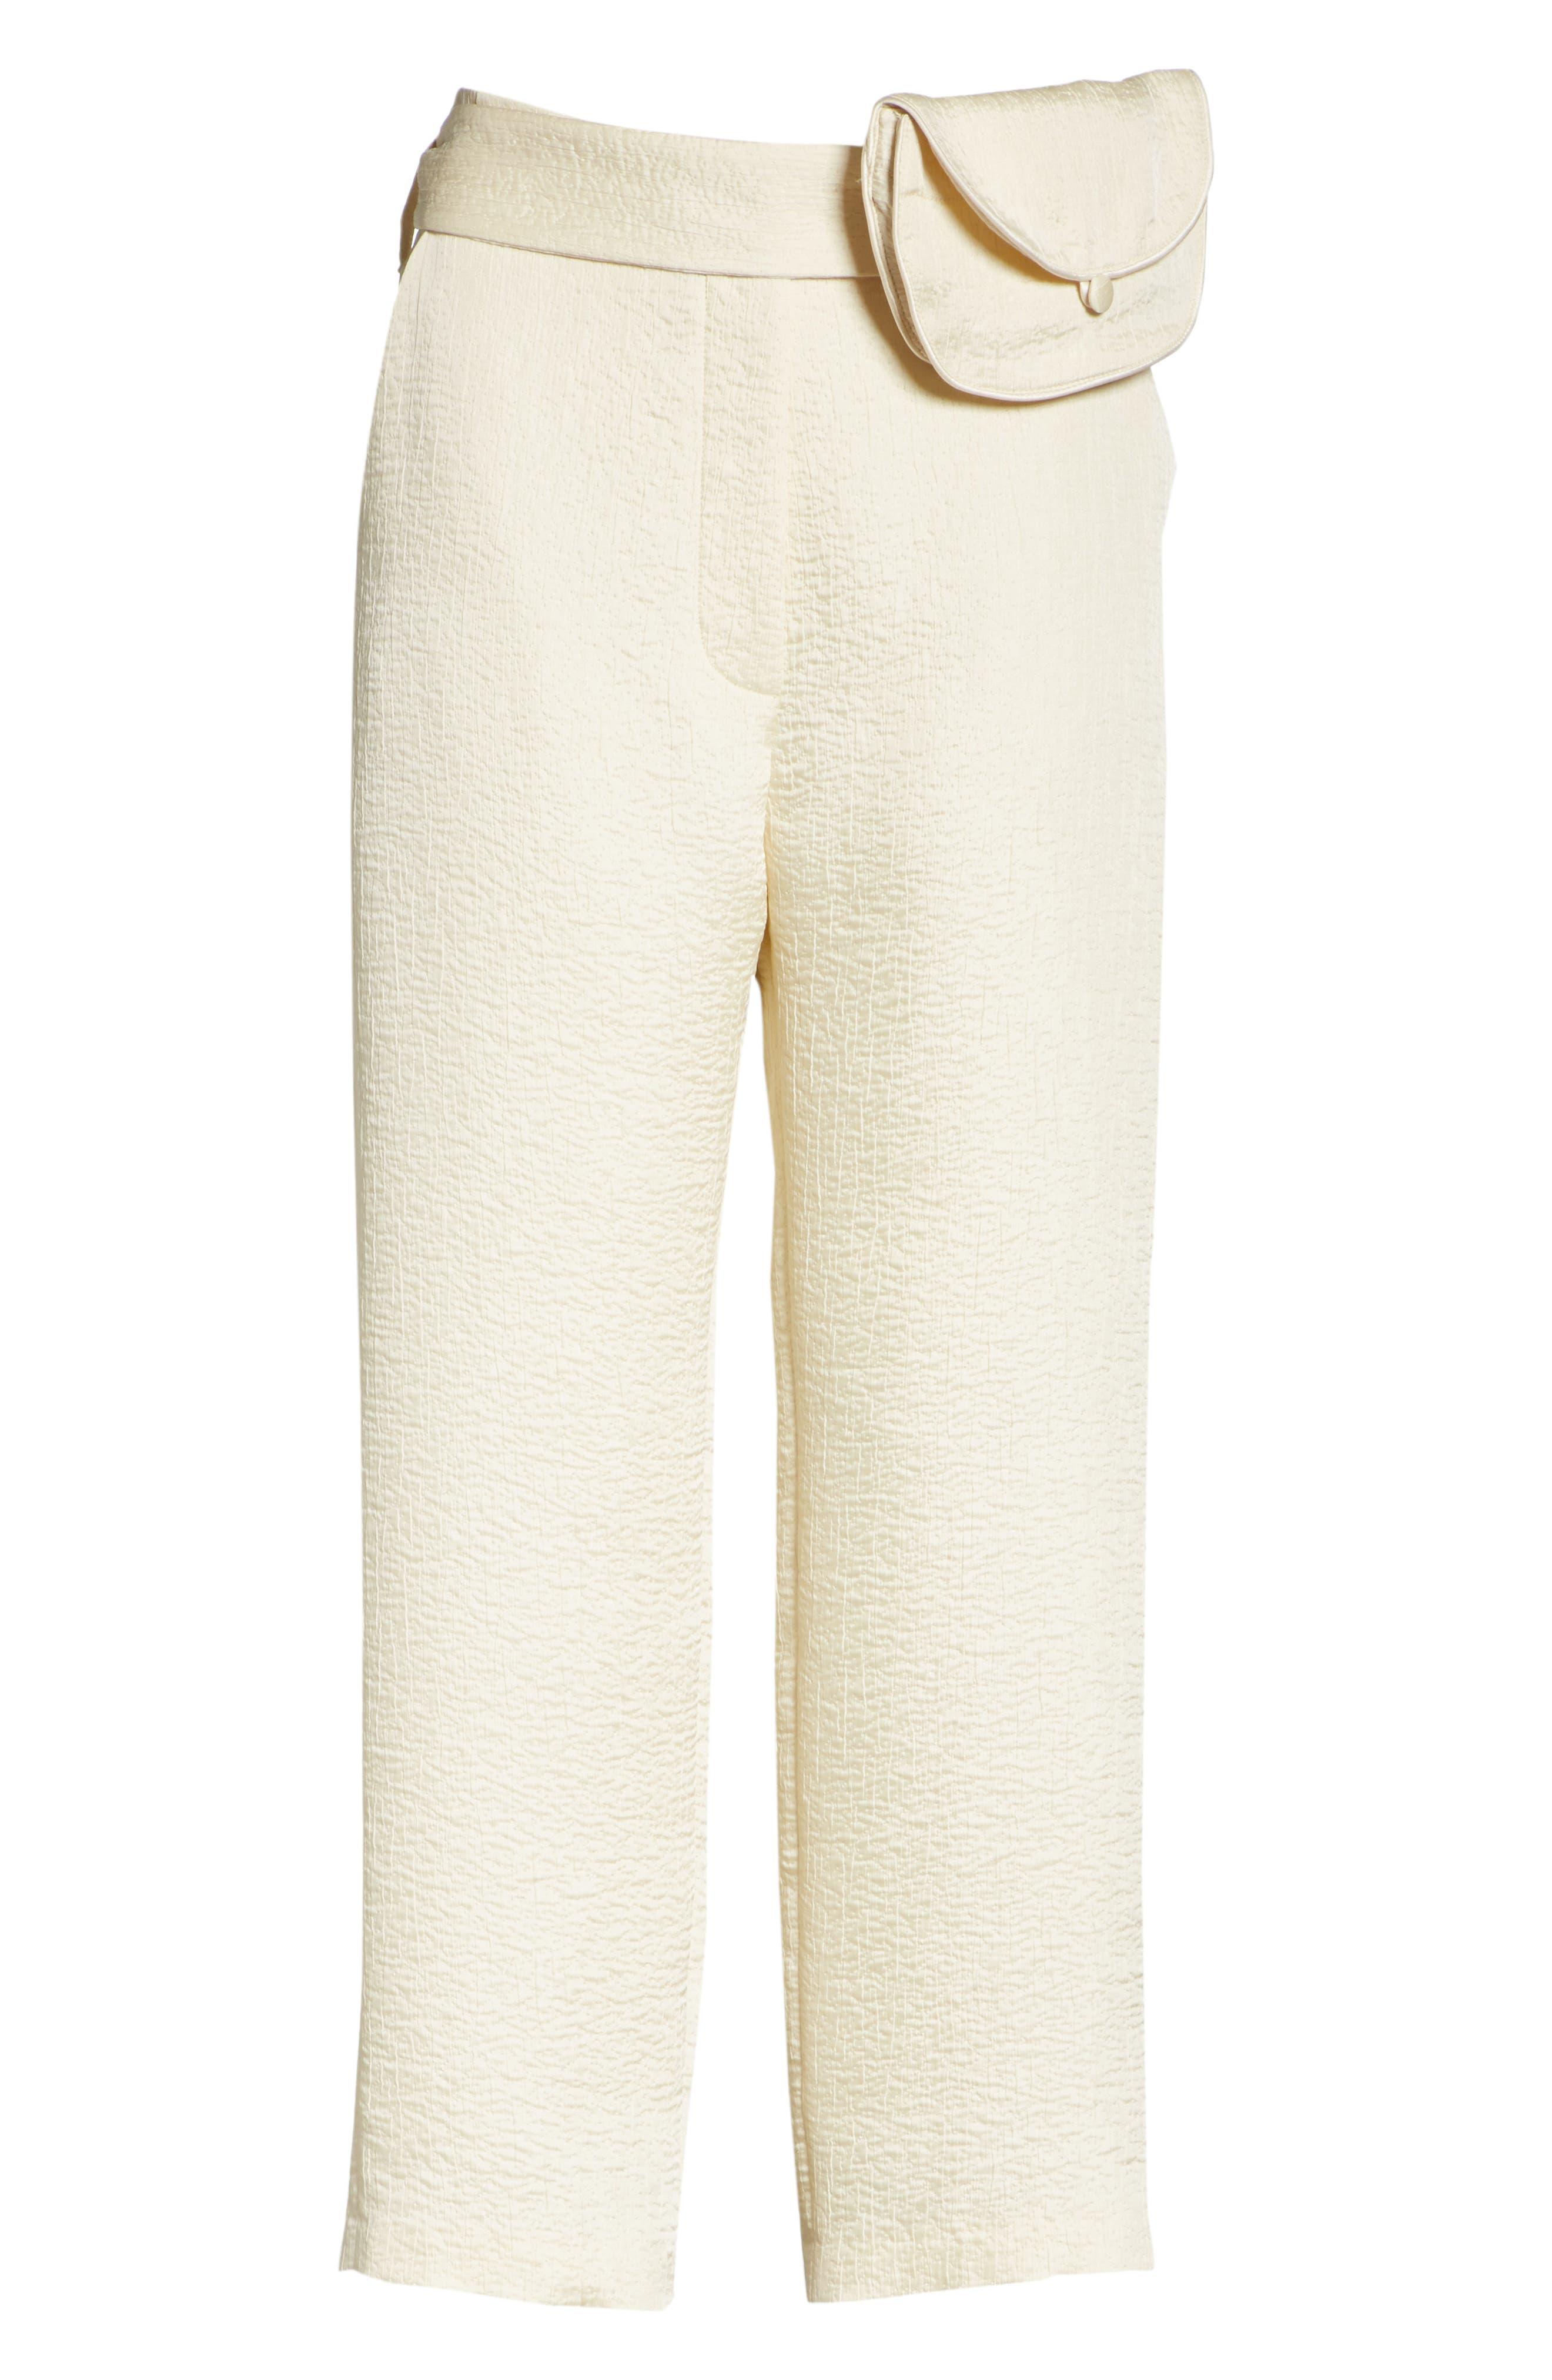 Raimo Belt Bag Crop Pants,                             Alternate thumbnail 6, color,                             Creme